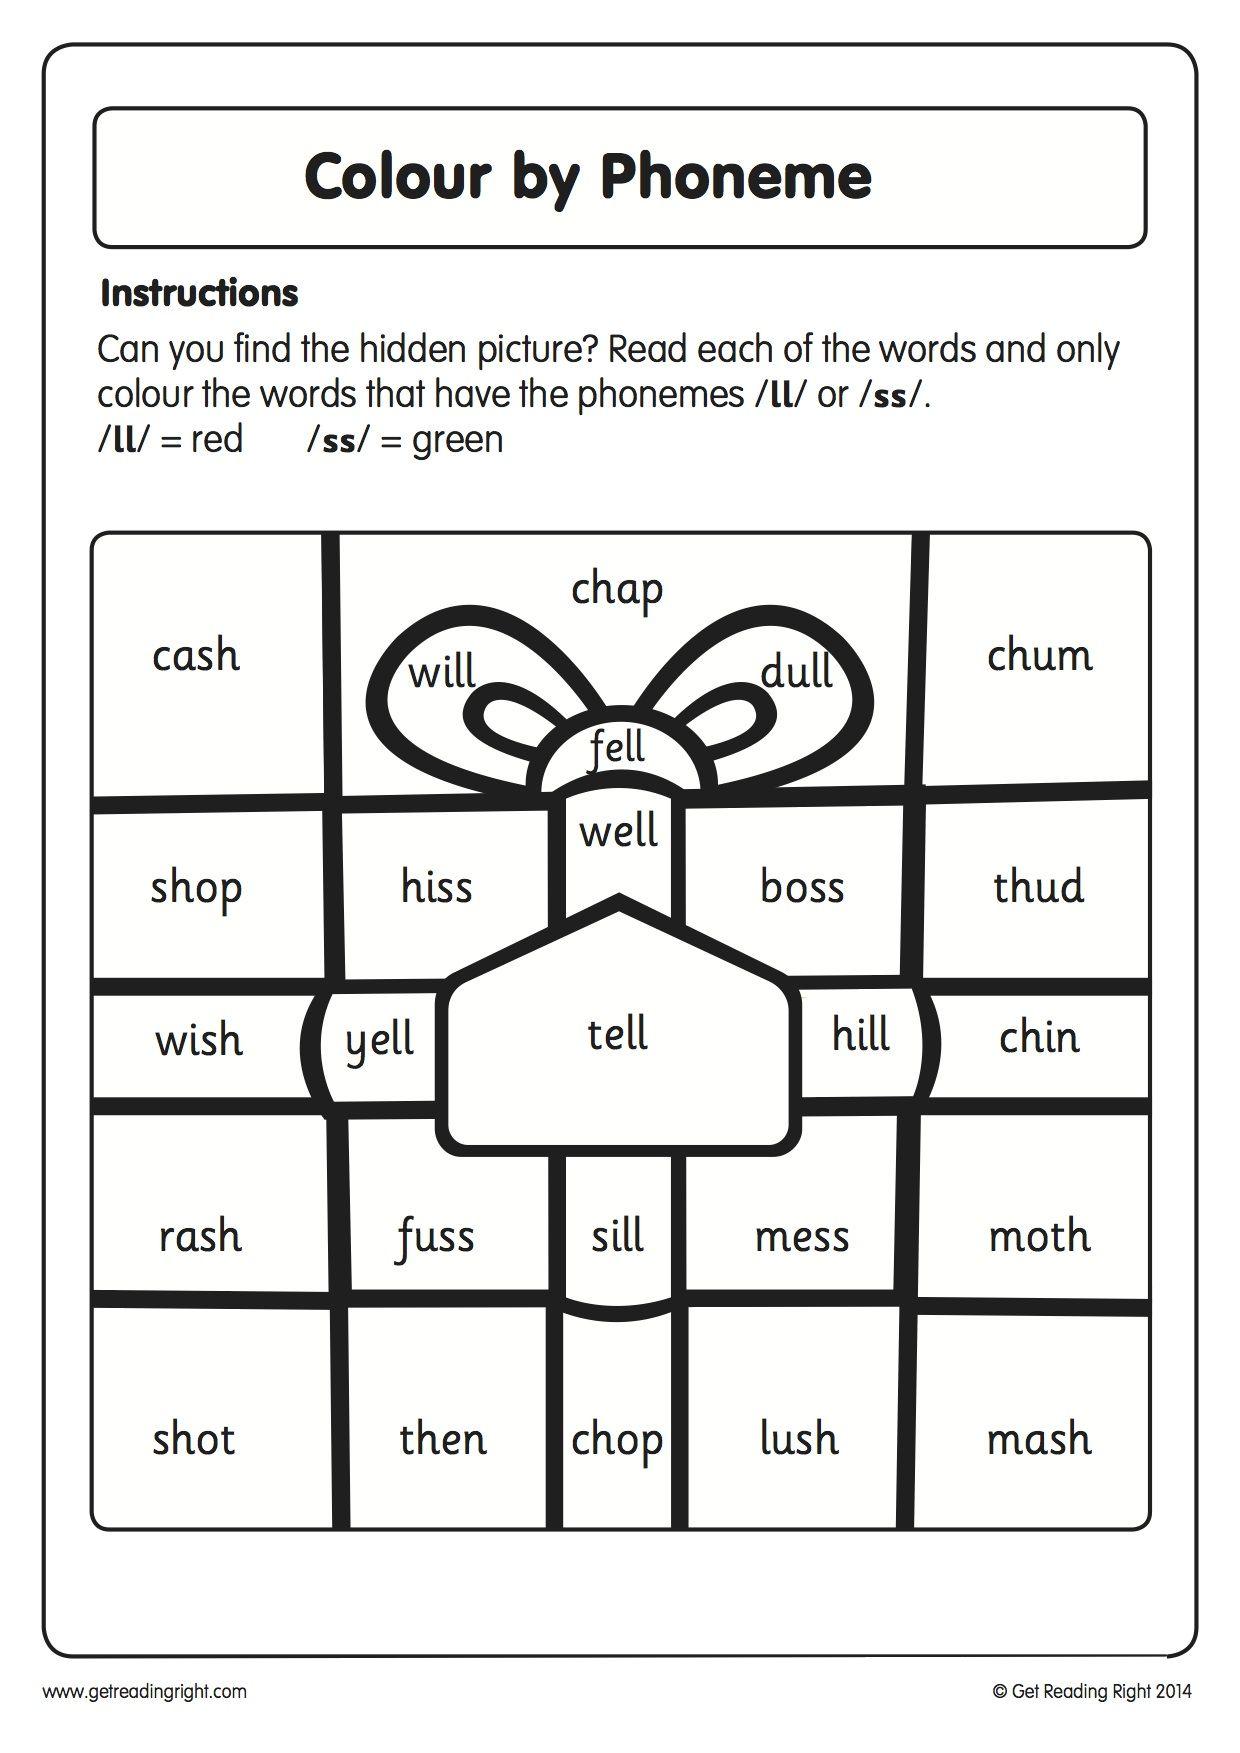 Blending Phonemes Worksheet   Printable Worksheets and Activities for  Teachers [ 1753 x 1240 Pixel ]